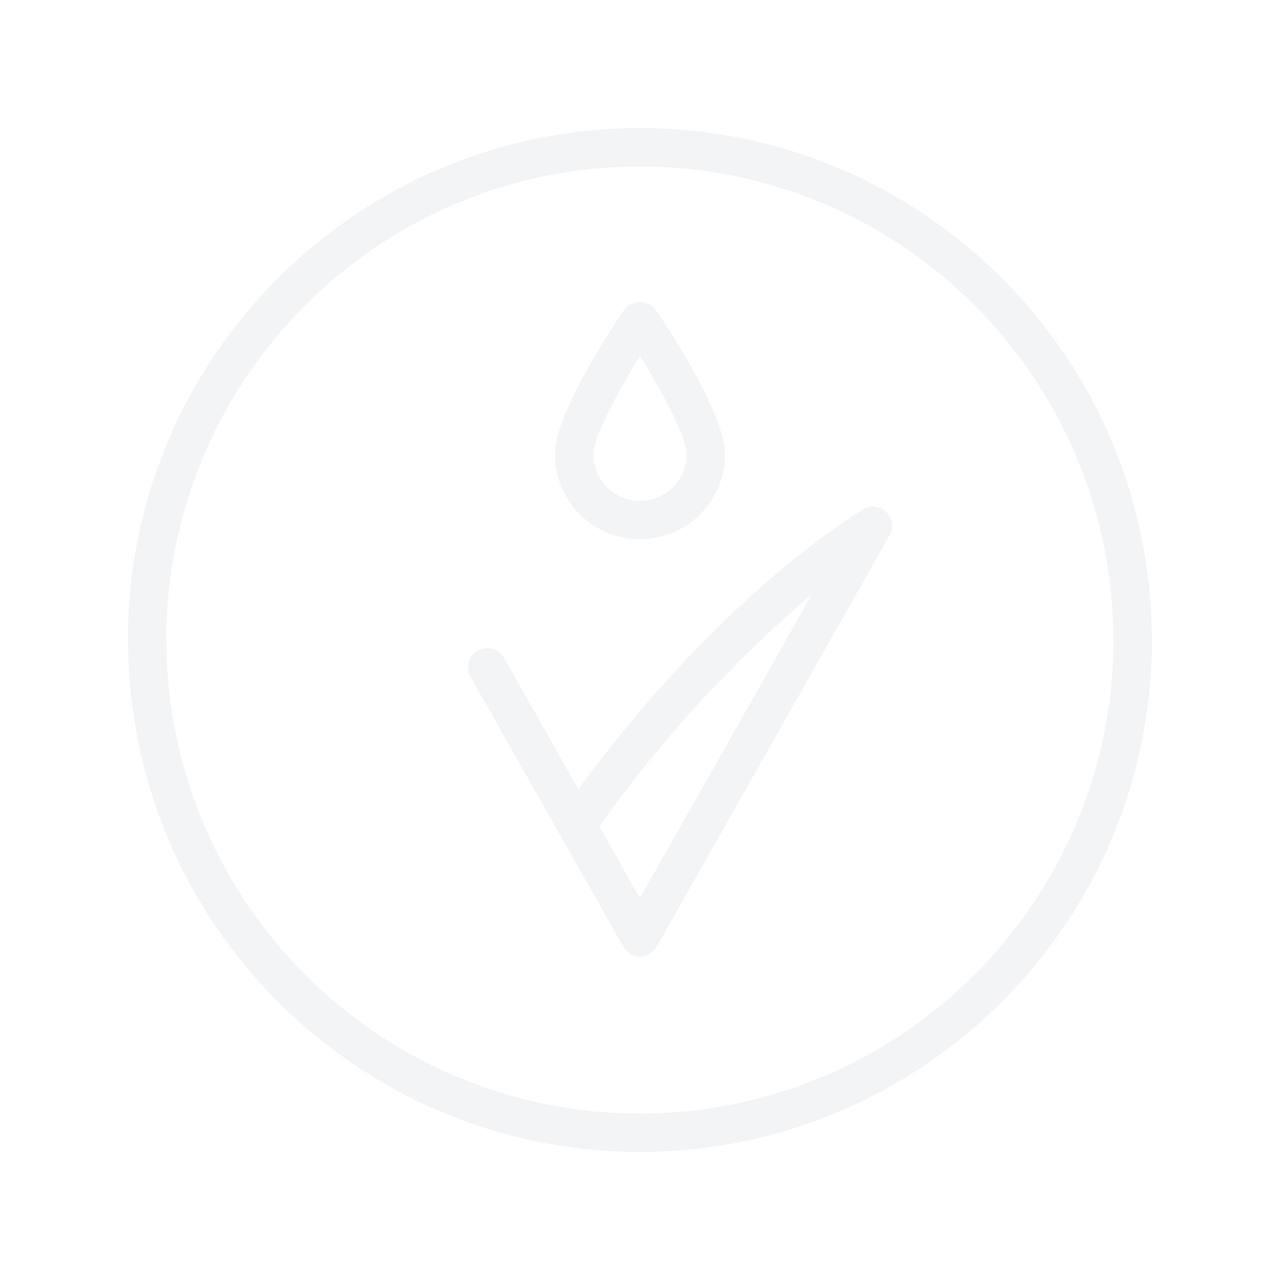 SHISEIDO Essential Energy Day Cream SPF20 дневной крем для лица 50ml